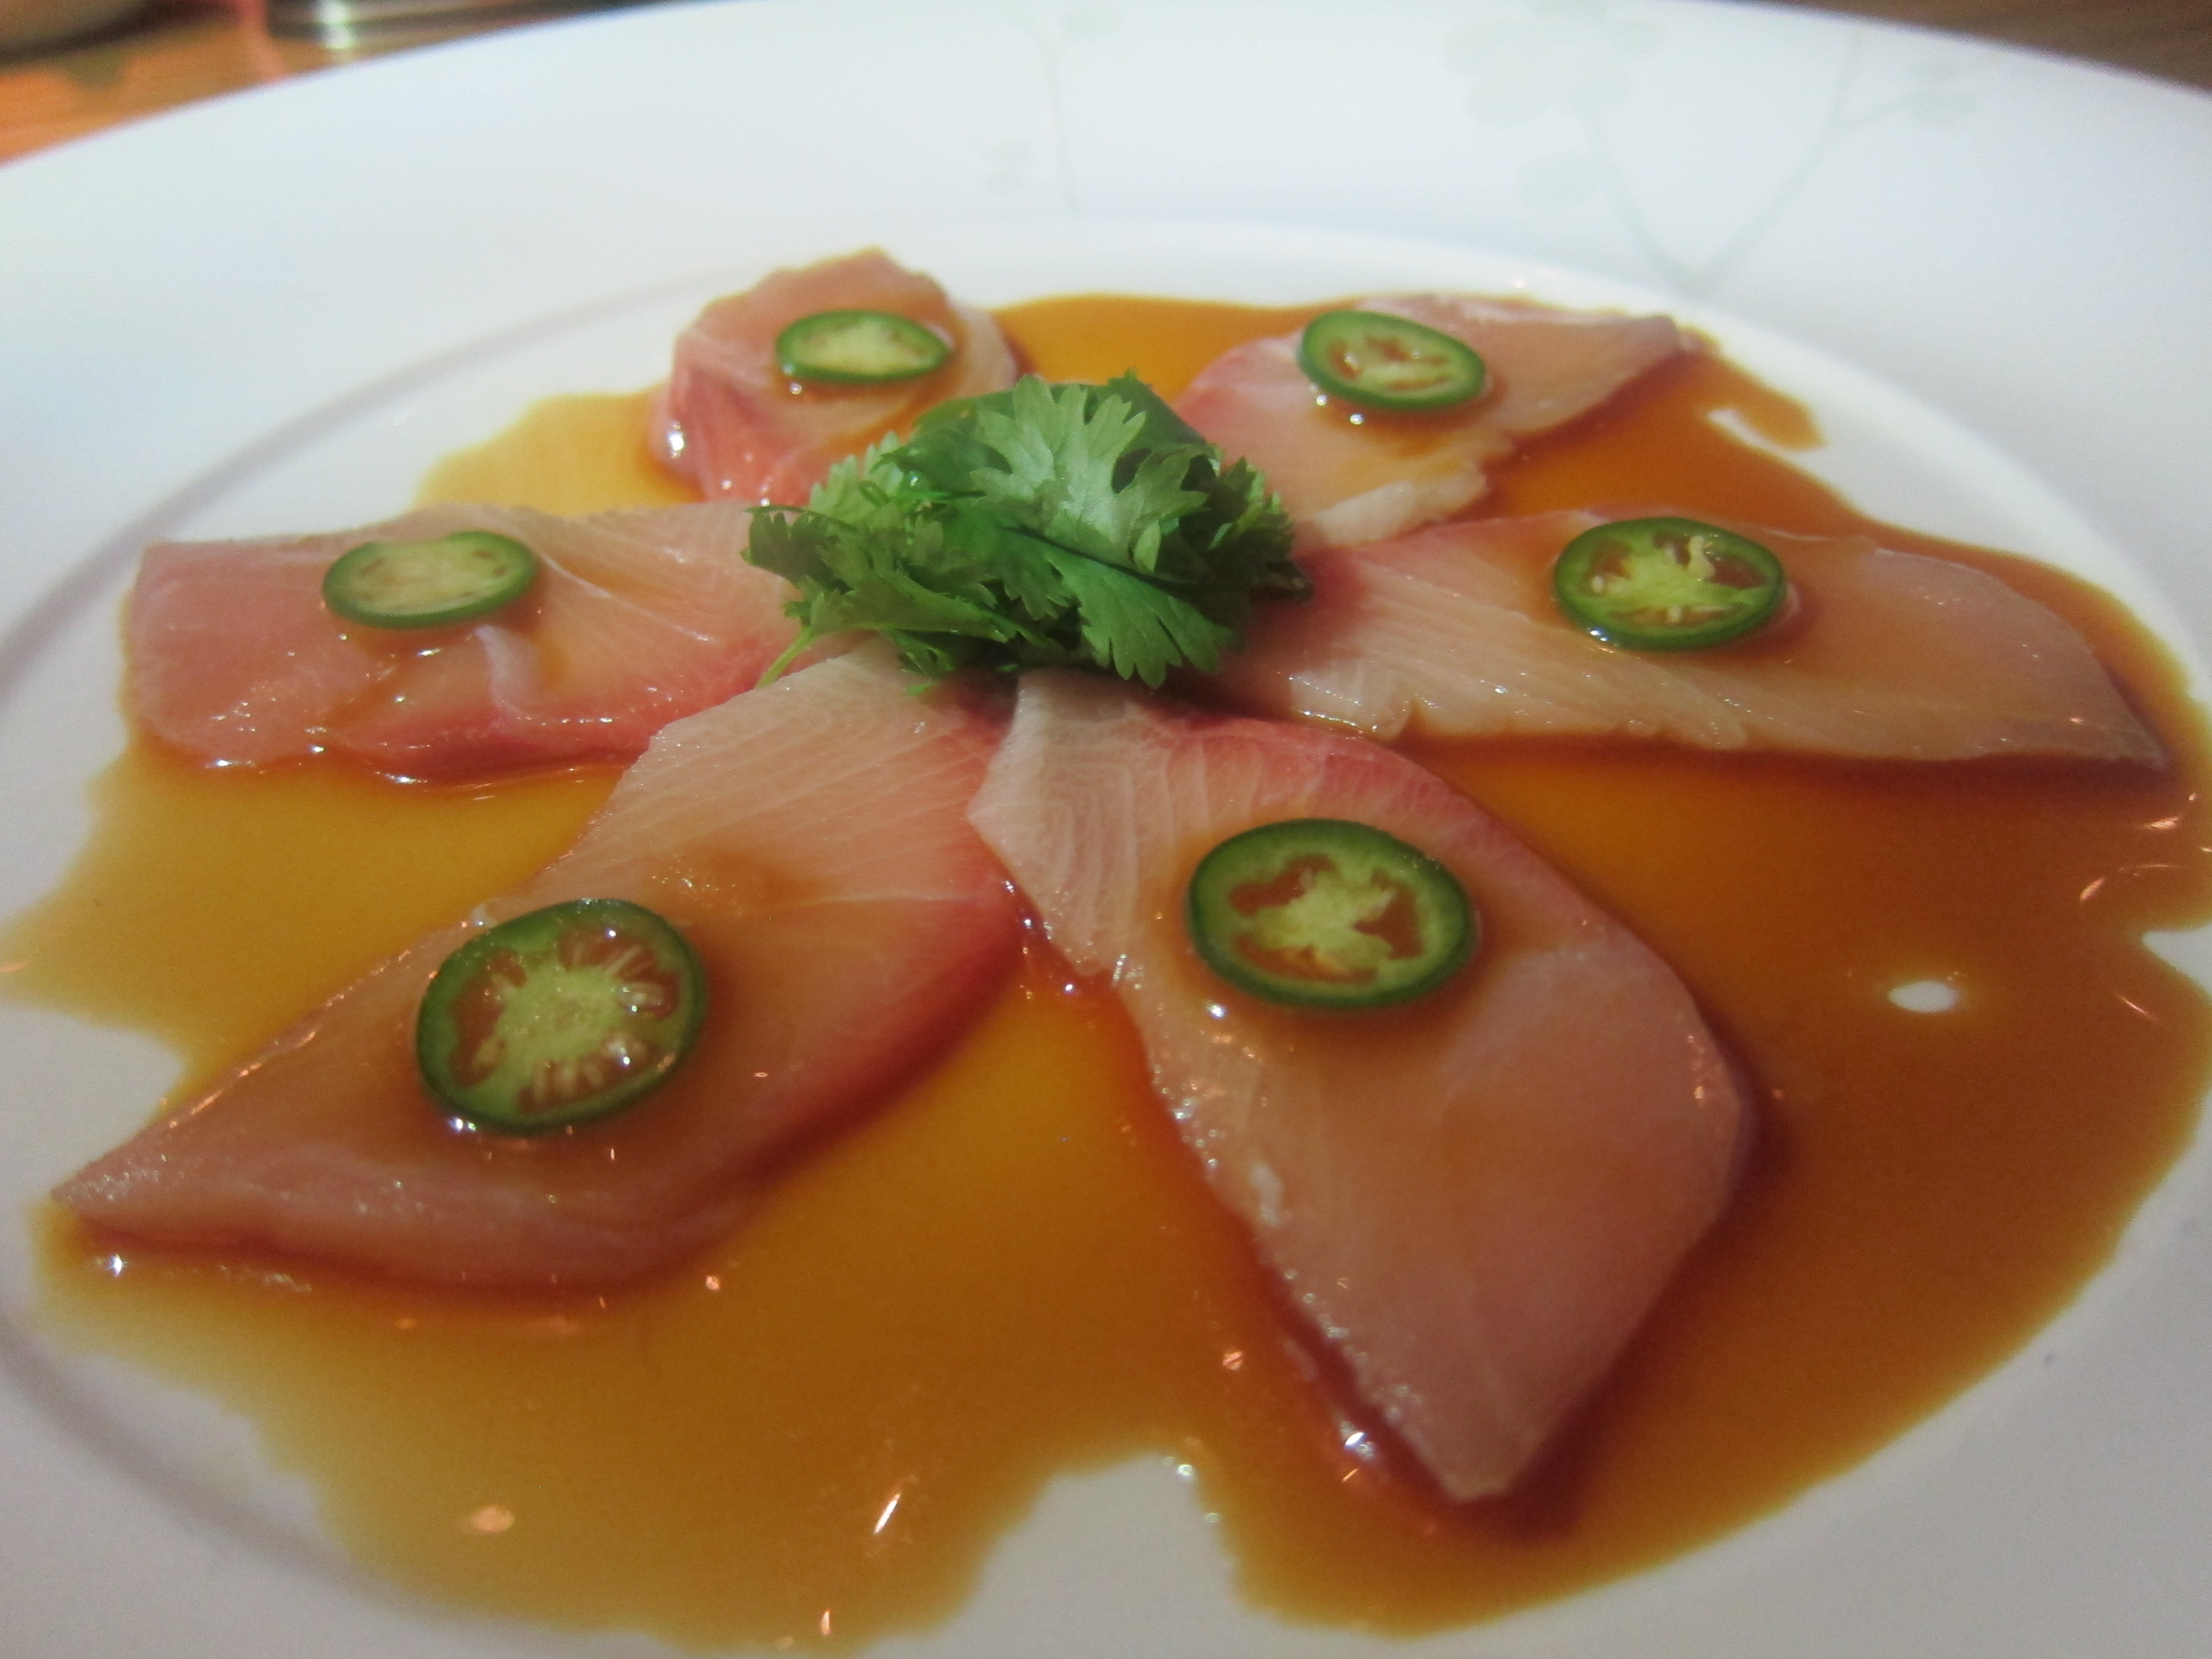 yellowtail sashimi with jalapeno garnish